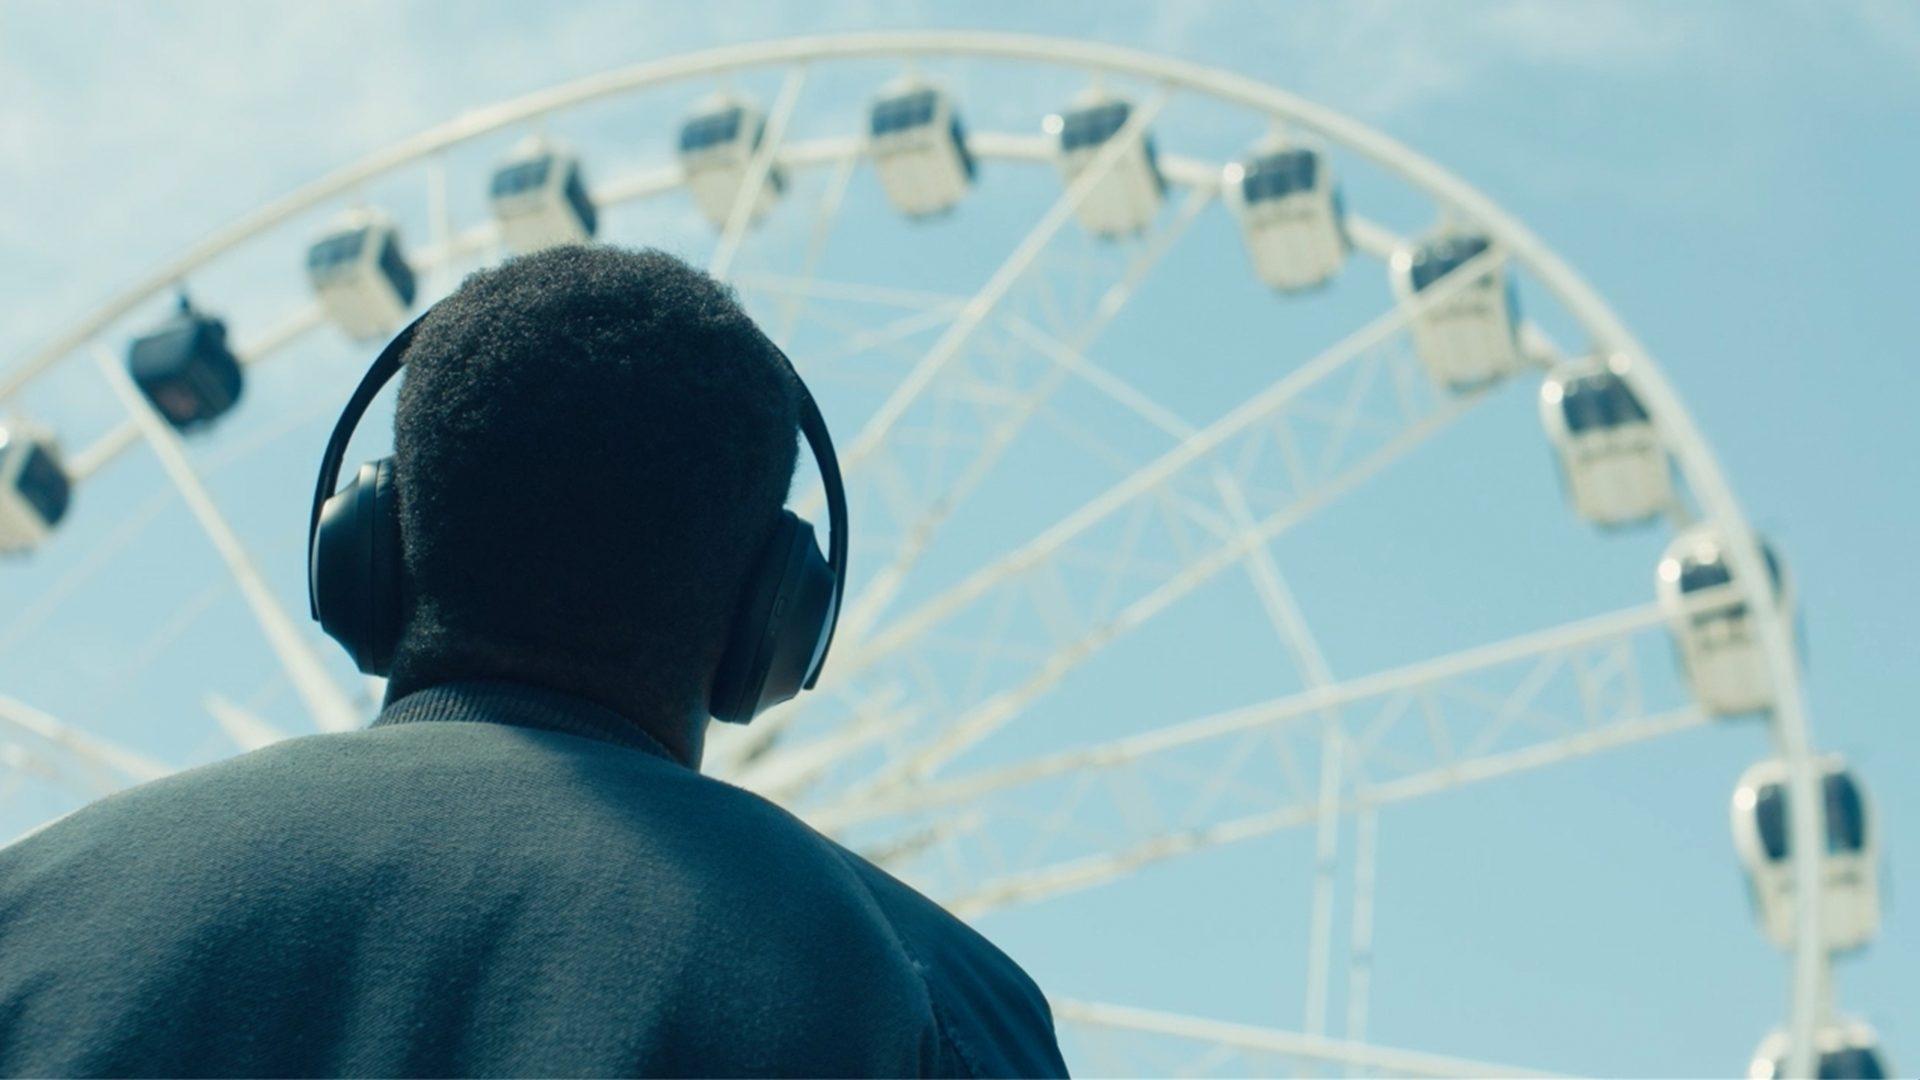 Bose Noise Cancelling Headphones 700 - tai nghe chống ồn mới nhất của Bose